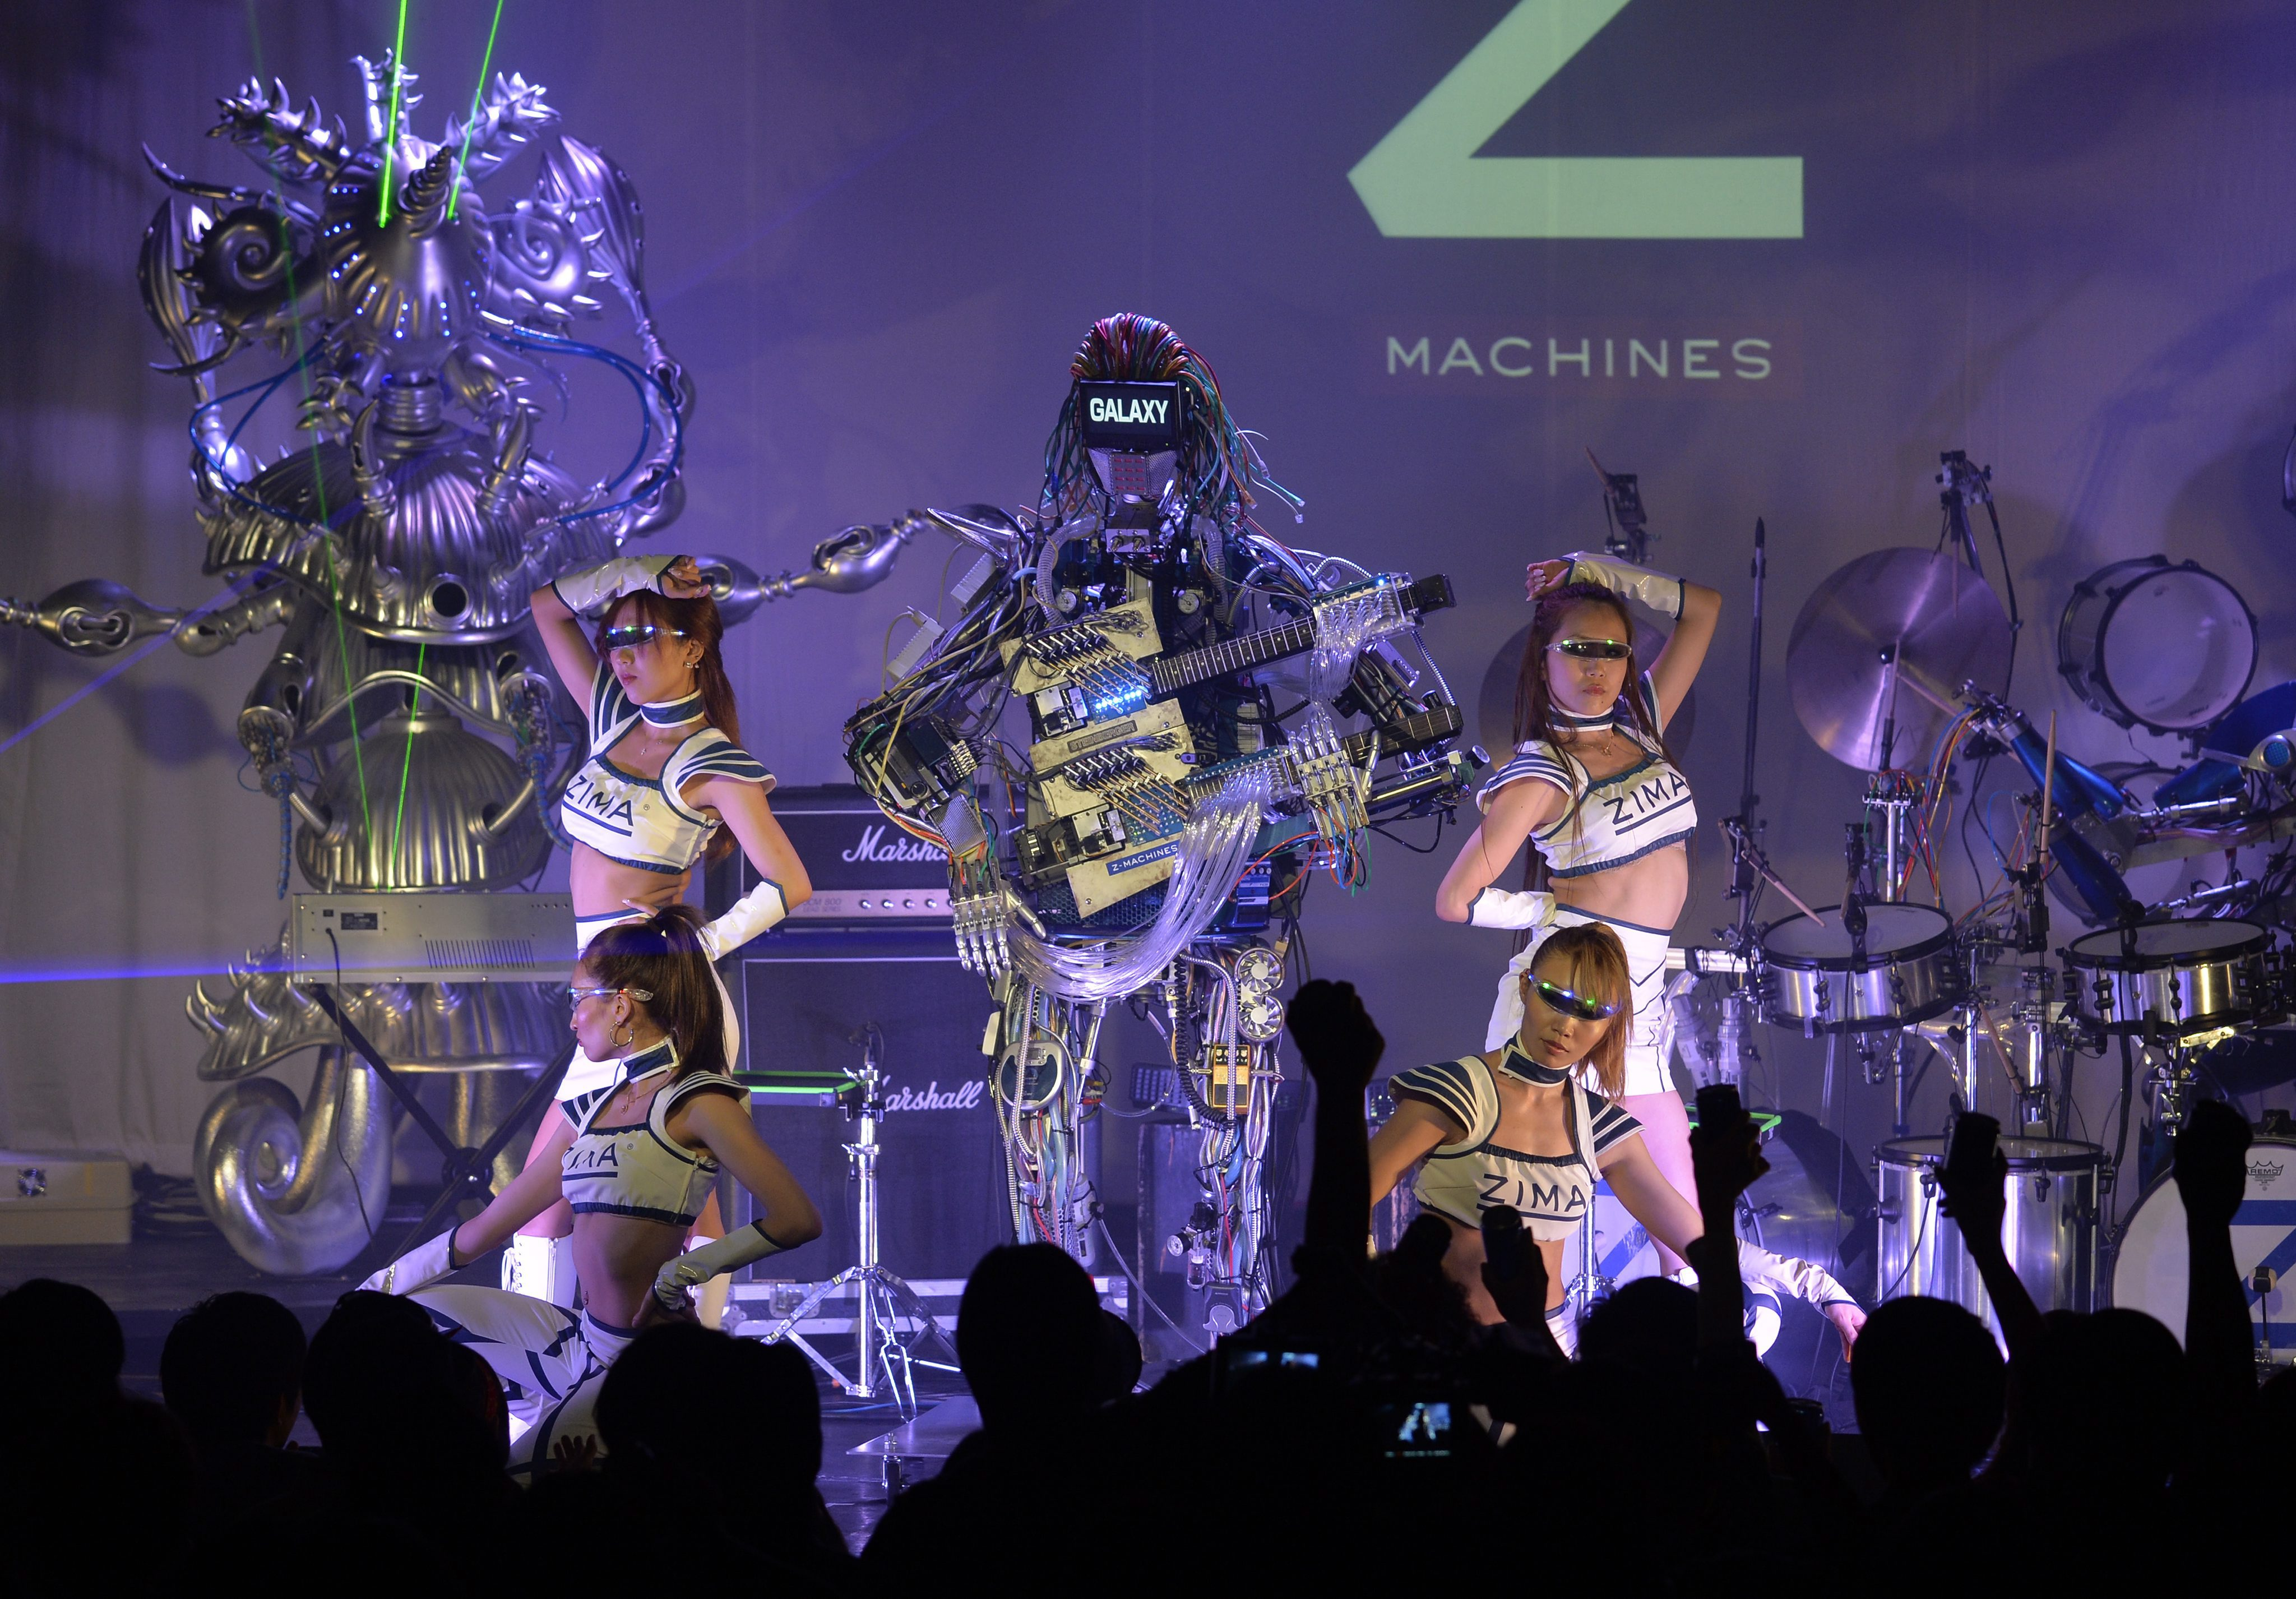 Gallery: Robo-rockers Z Machines preform debut gig